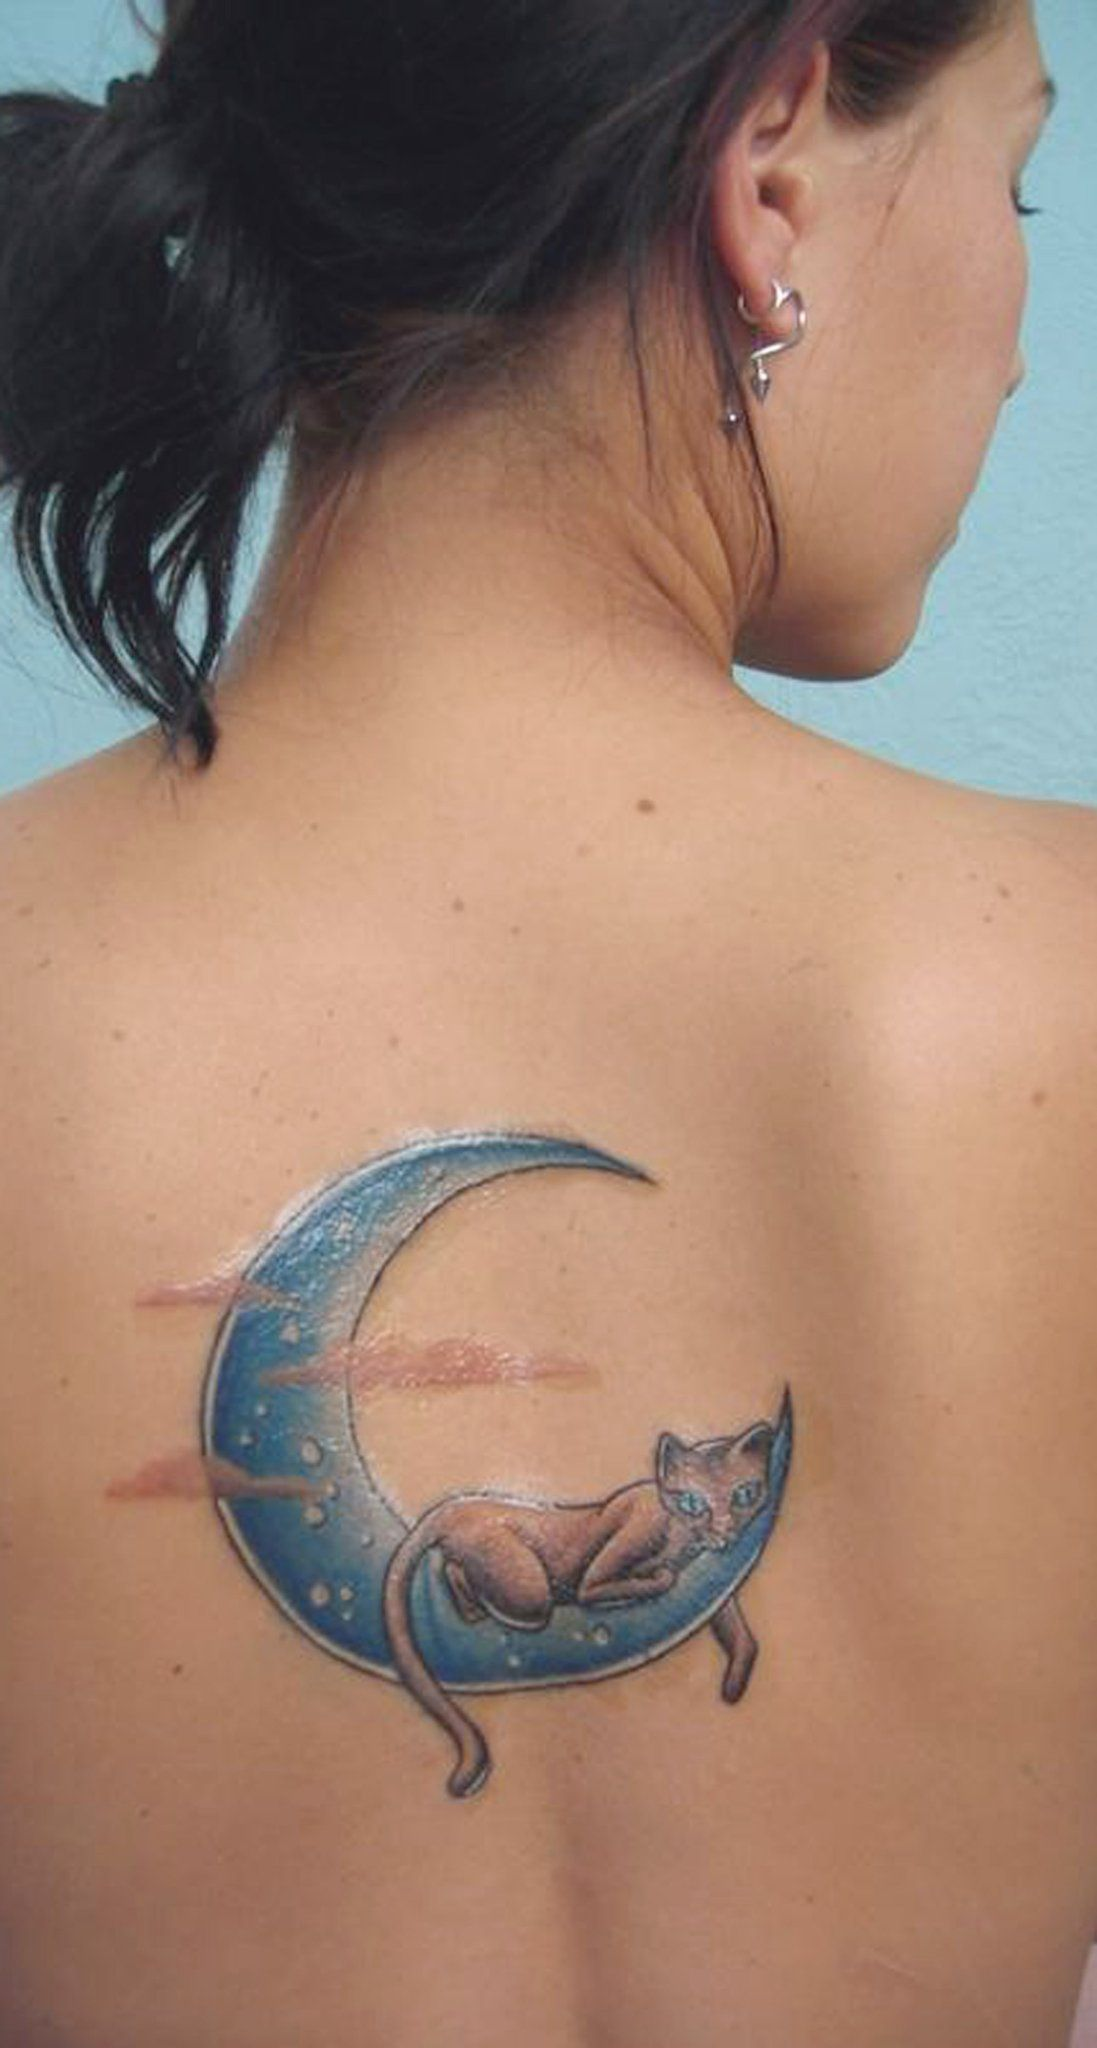 e18df2b41 Unique Watercolor Crescent Moon and Cat Back Tattoo Ideas for Women - Único  gato Acuarela en luna Ideas de tatuaje para mujeres - www.MyBodiArt.com